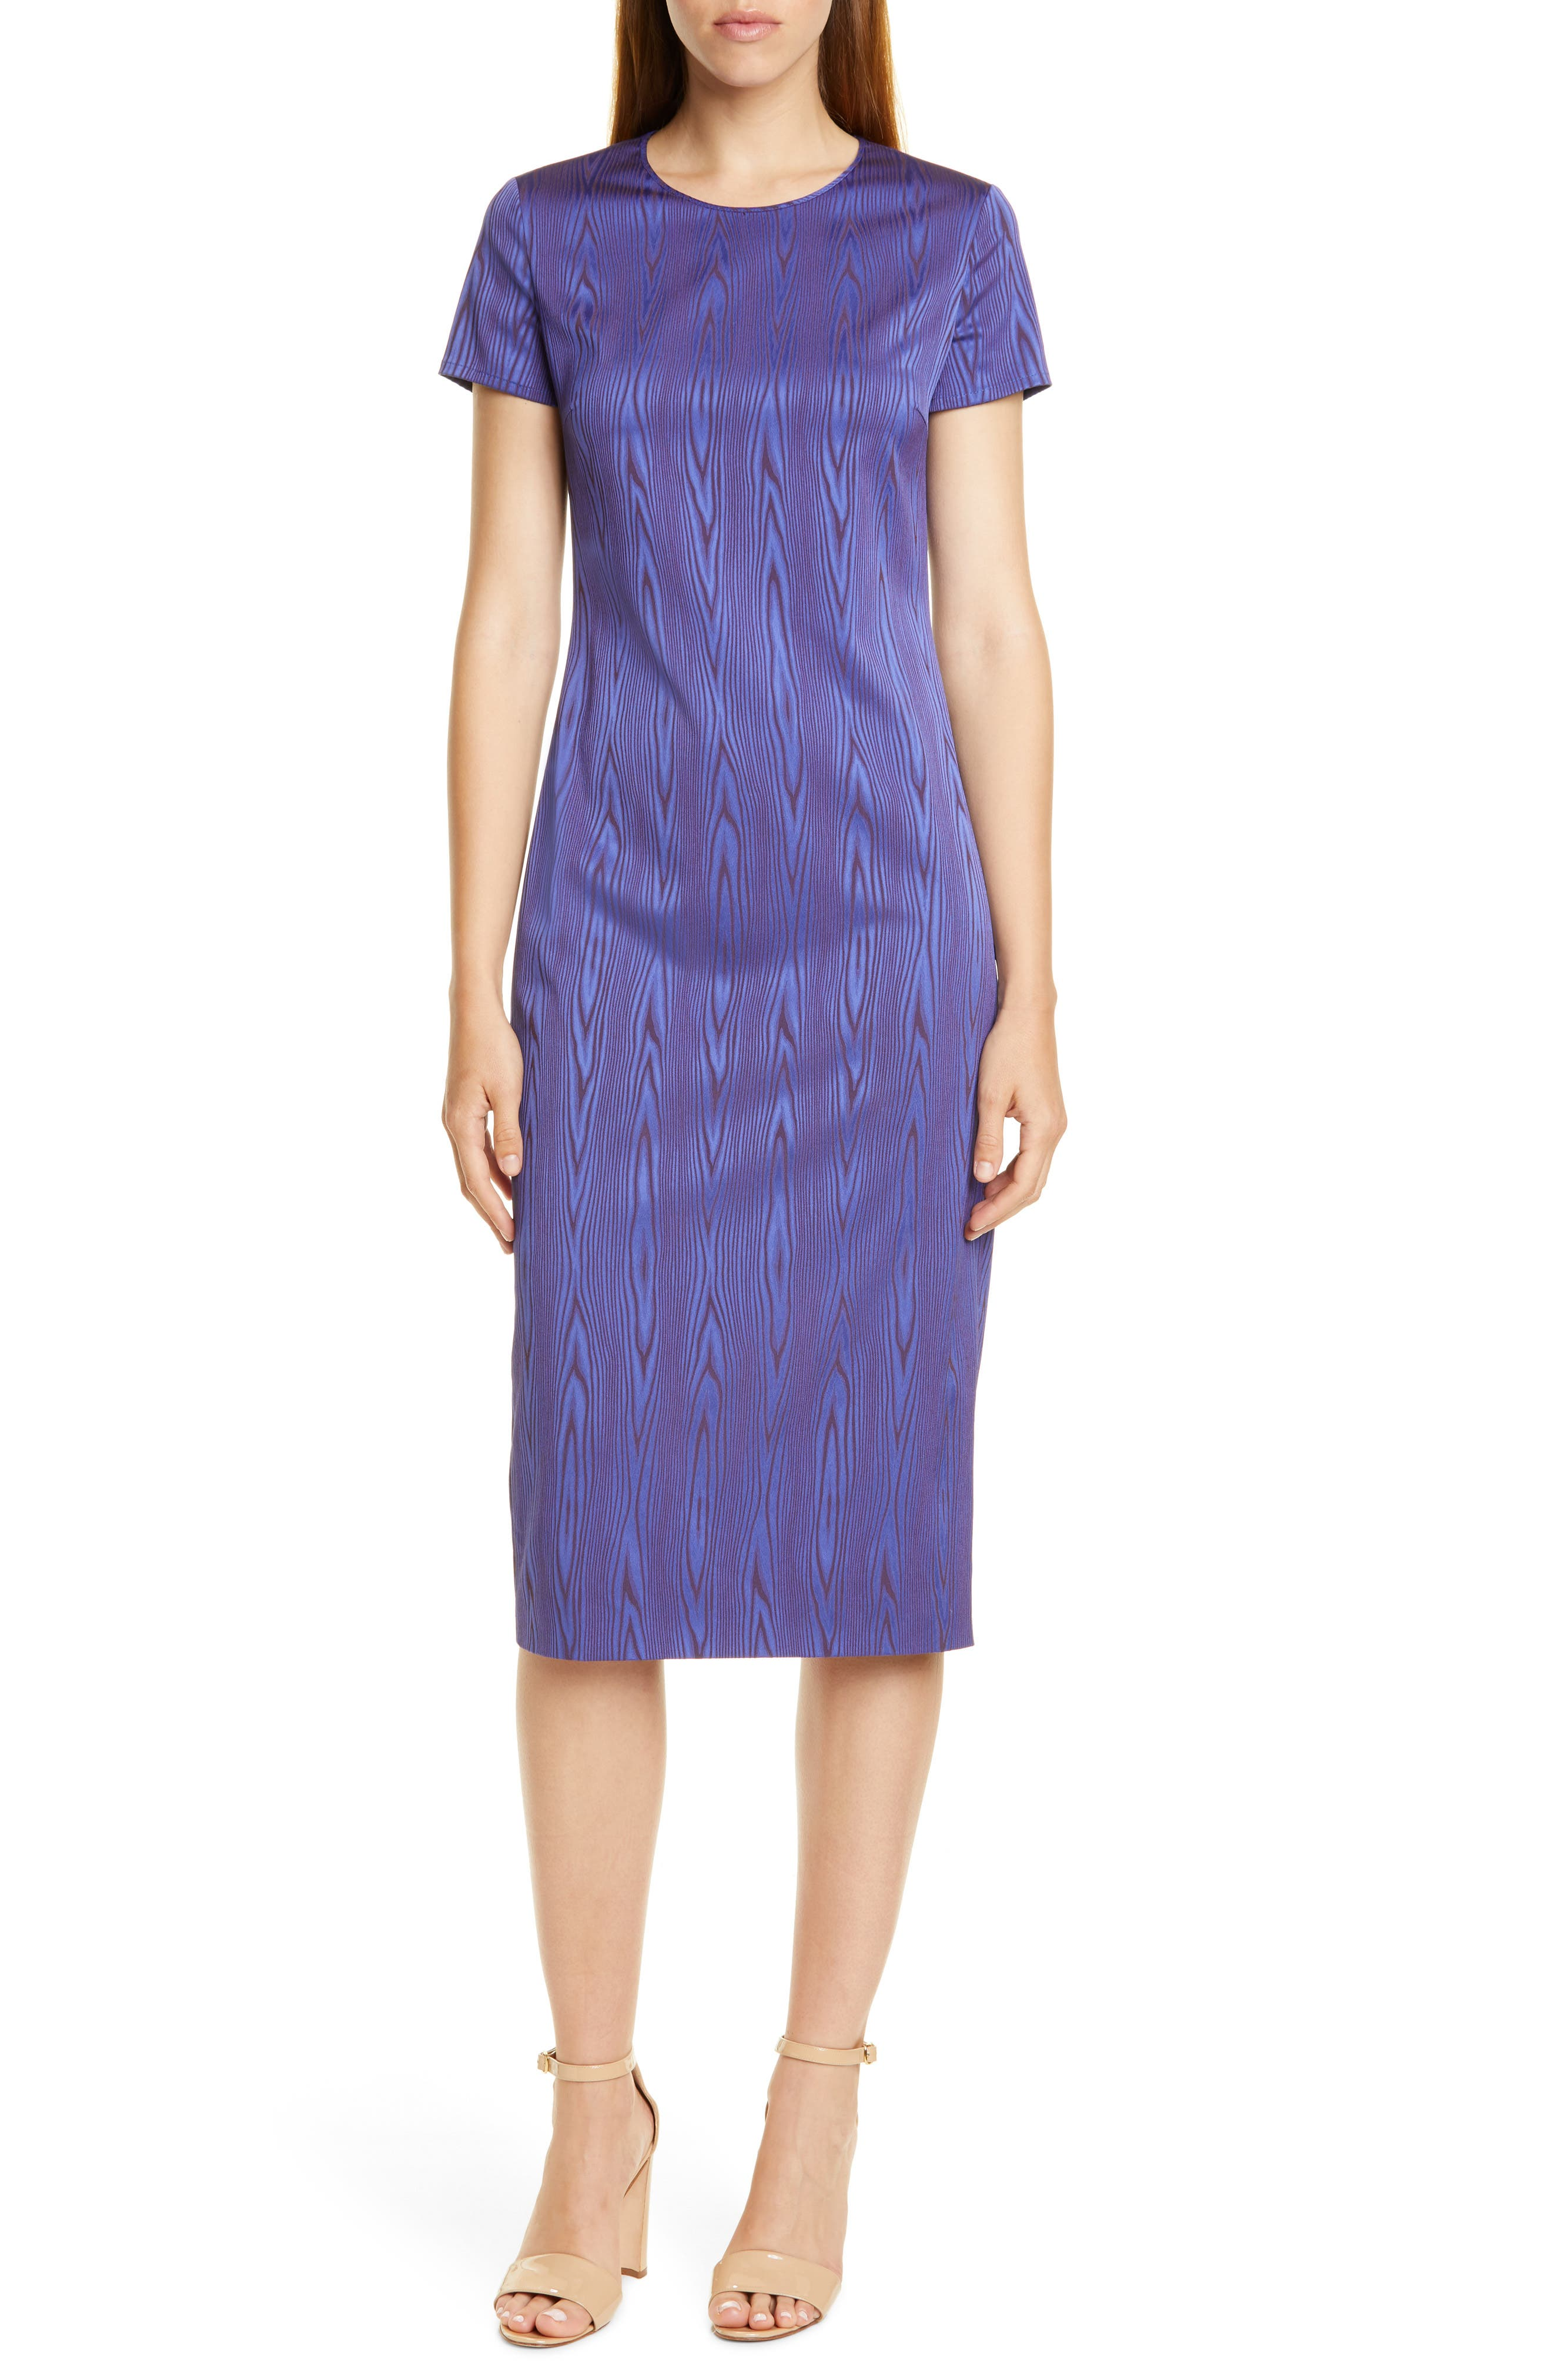 Boss Dixery Jacquard Sheath Dress, Blue (Nordstrom Exclusive)